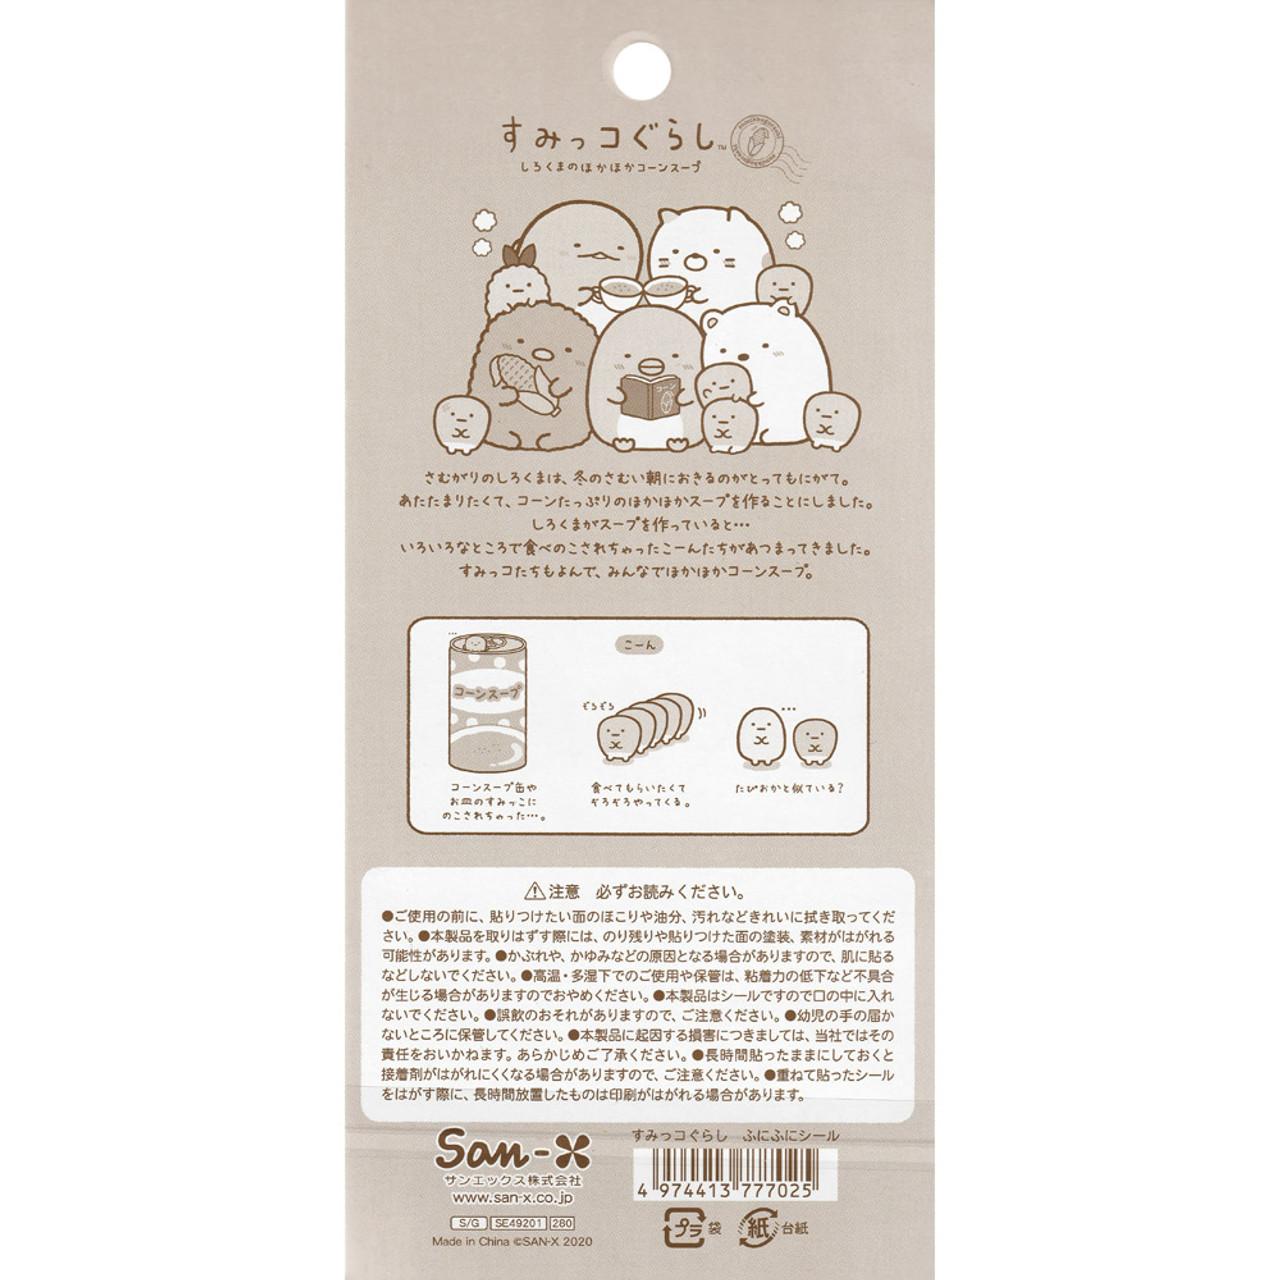 Sumikko Gurashi Funny Collection Sticker SE49201 - Corn ( Back View )